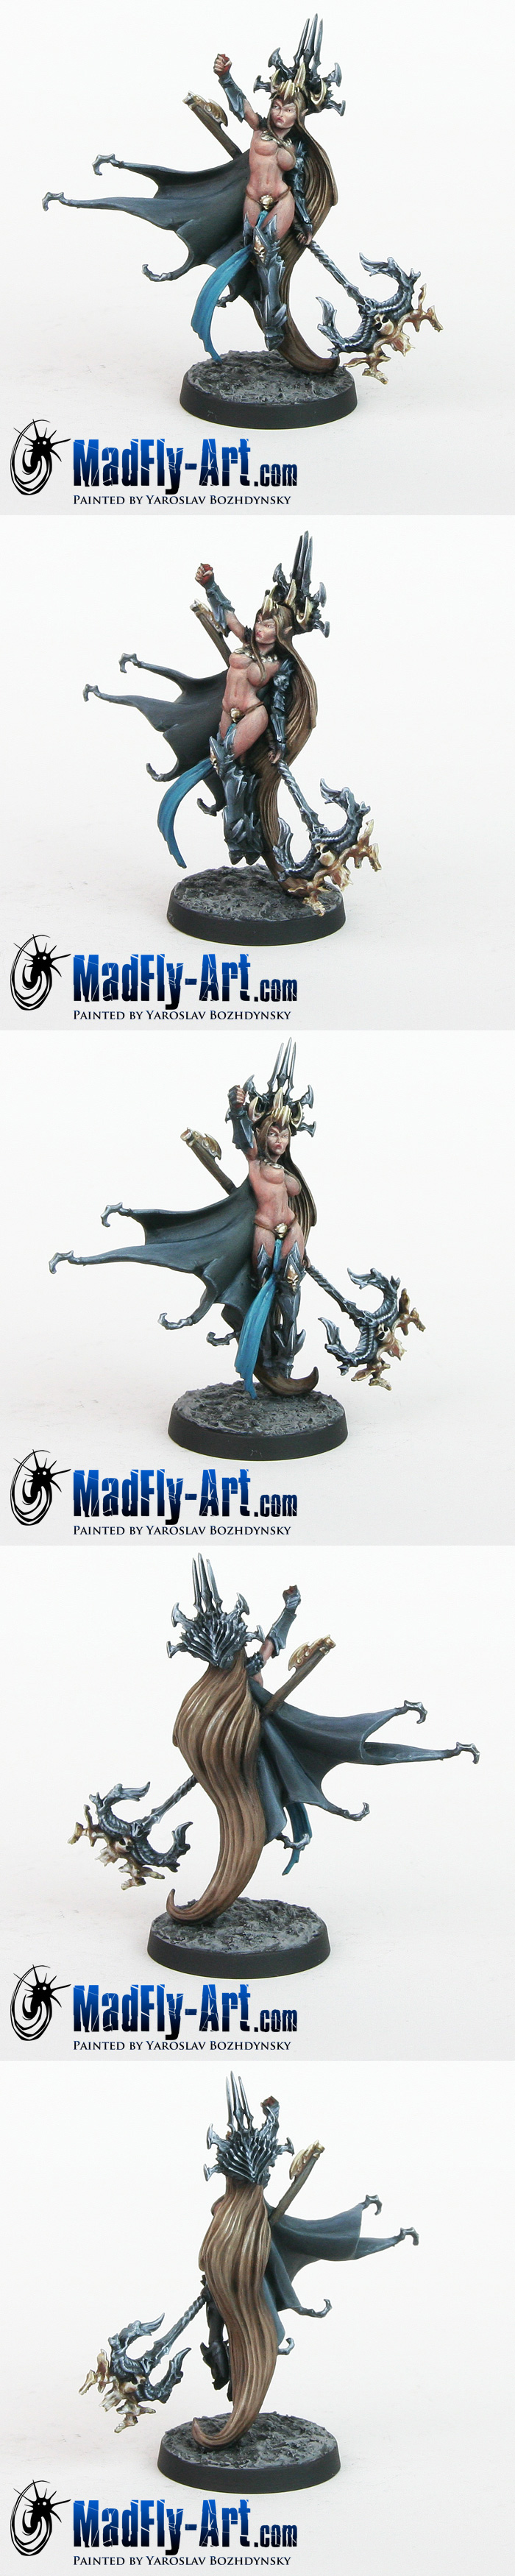 Shiveryah, Dark Elves Sorceress